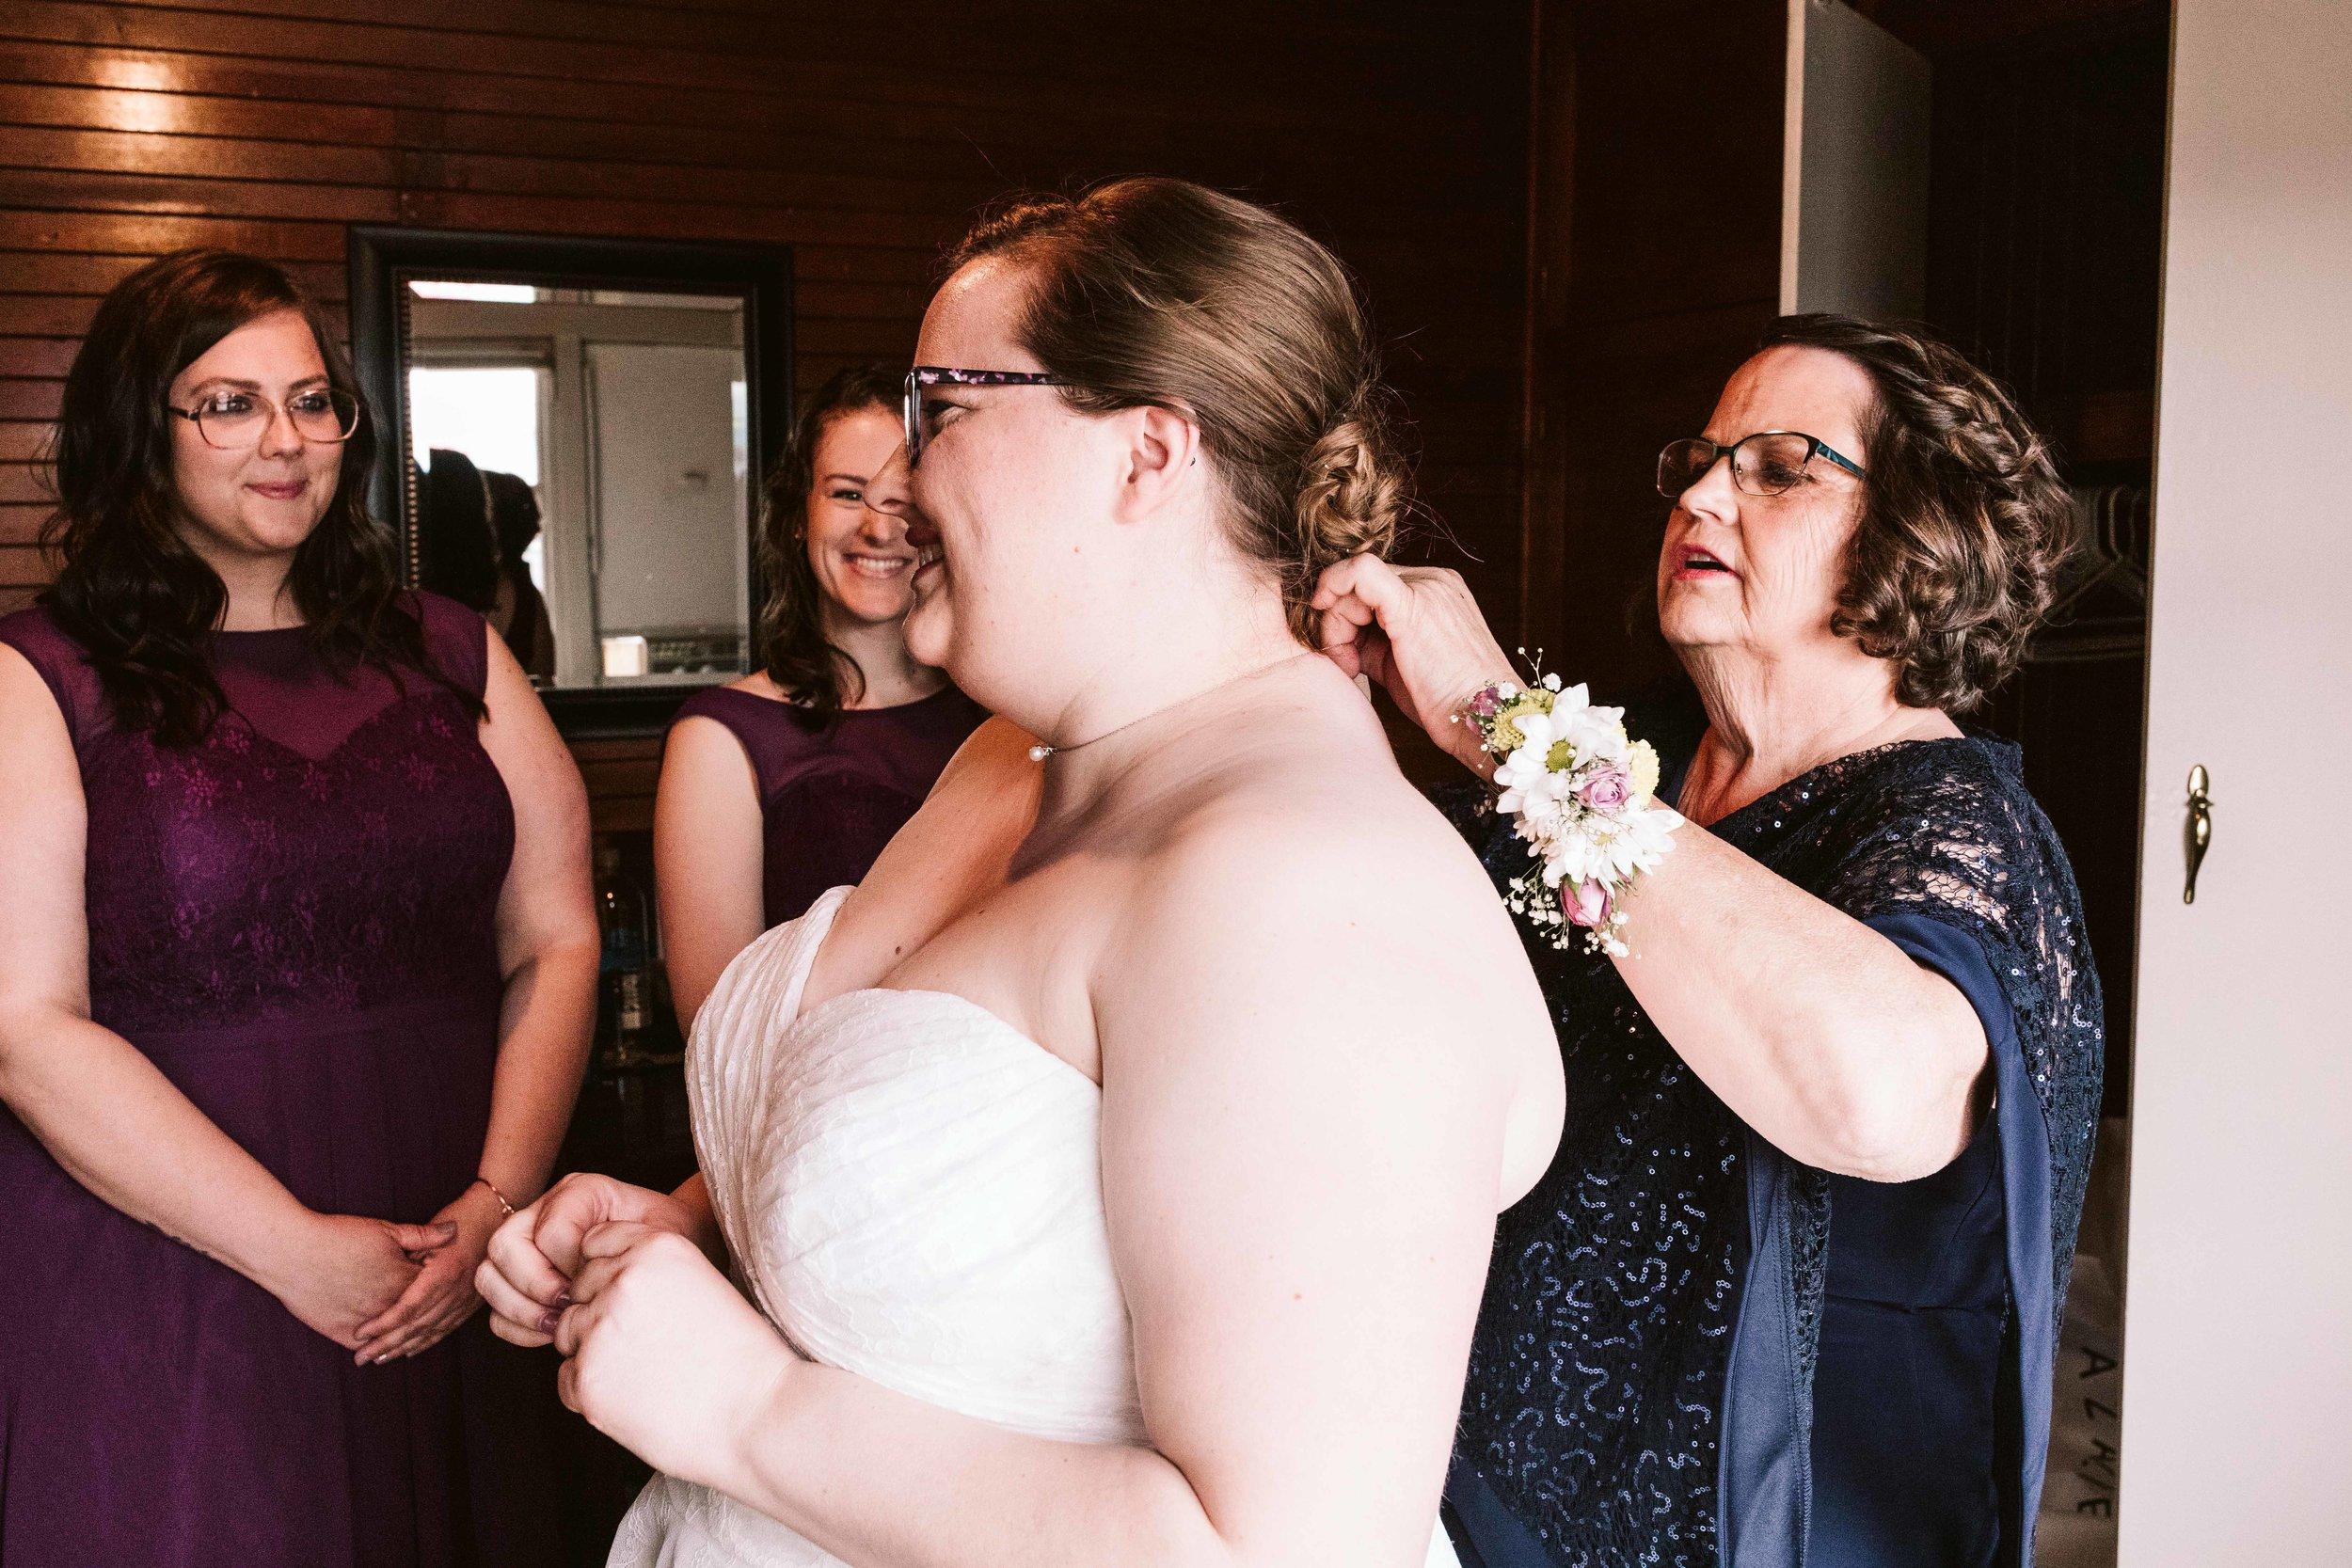 womens-century-club-wedding-15.jpg